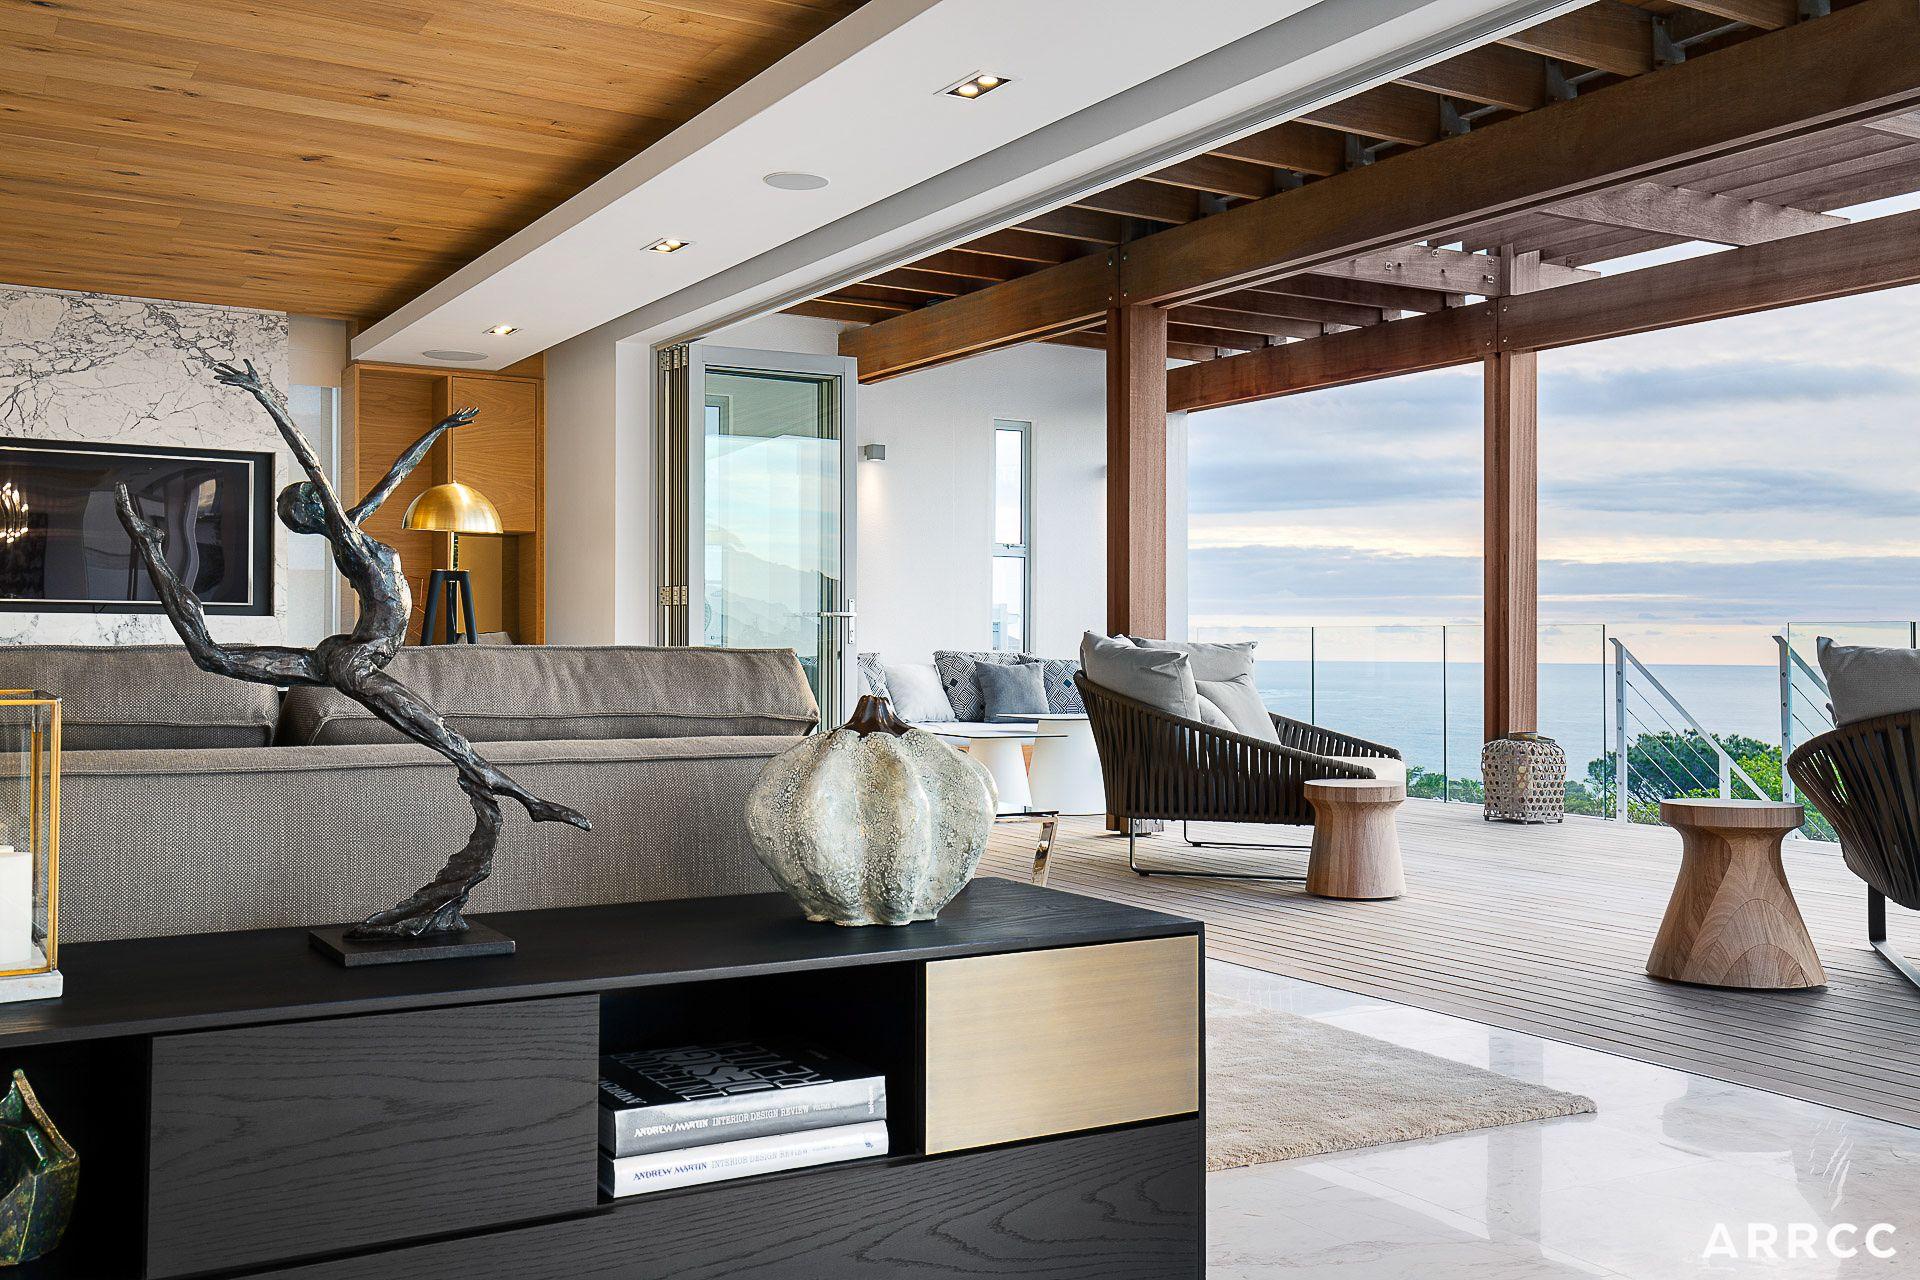 ZA Cape Villa - ARRCC inspiration, design inspiration, interior ...